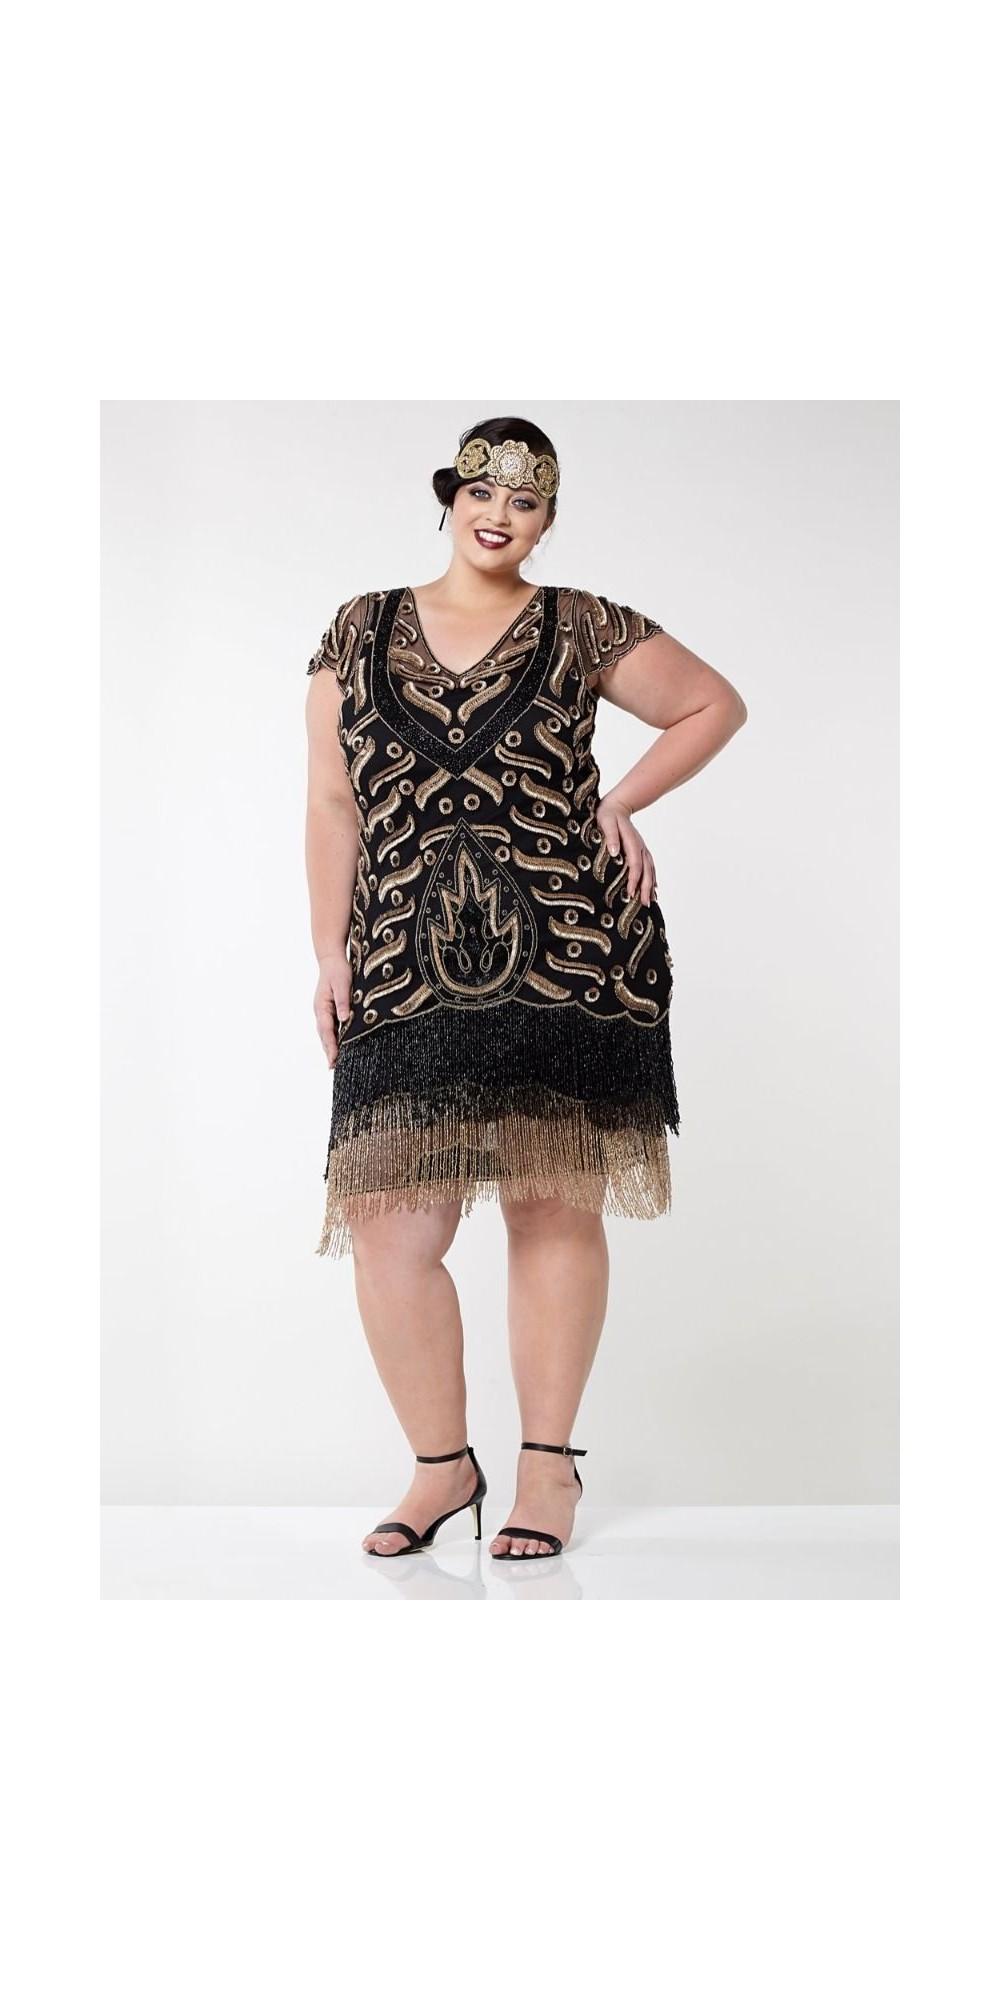 Art Deco Fringe Party Dress in Black Gold